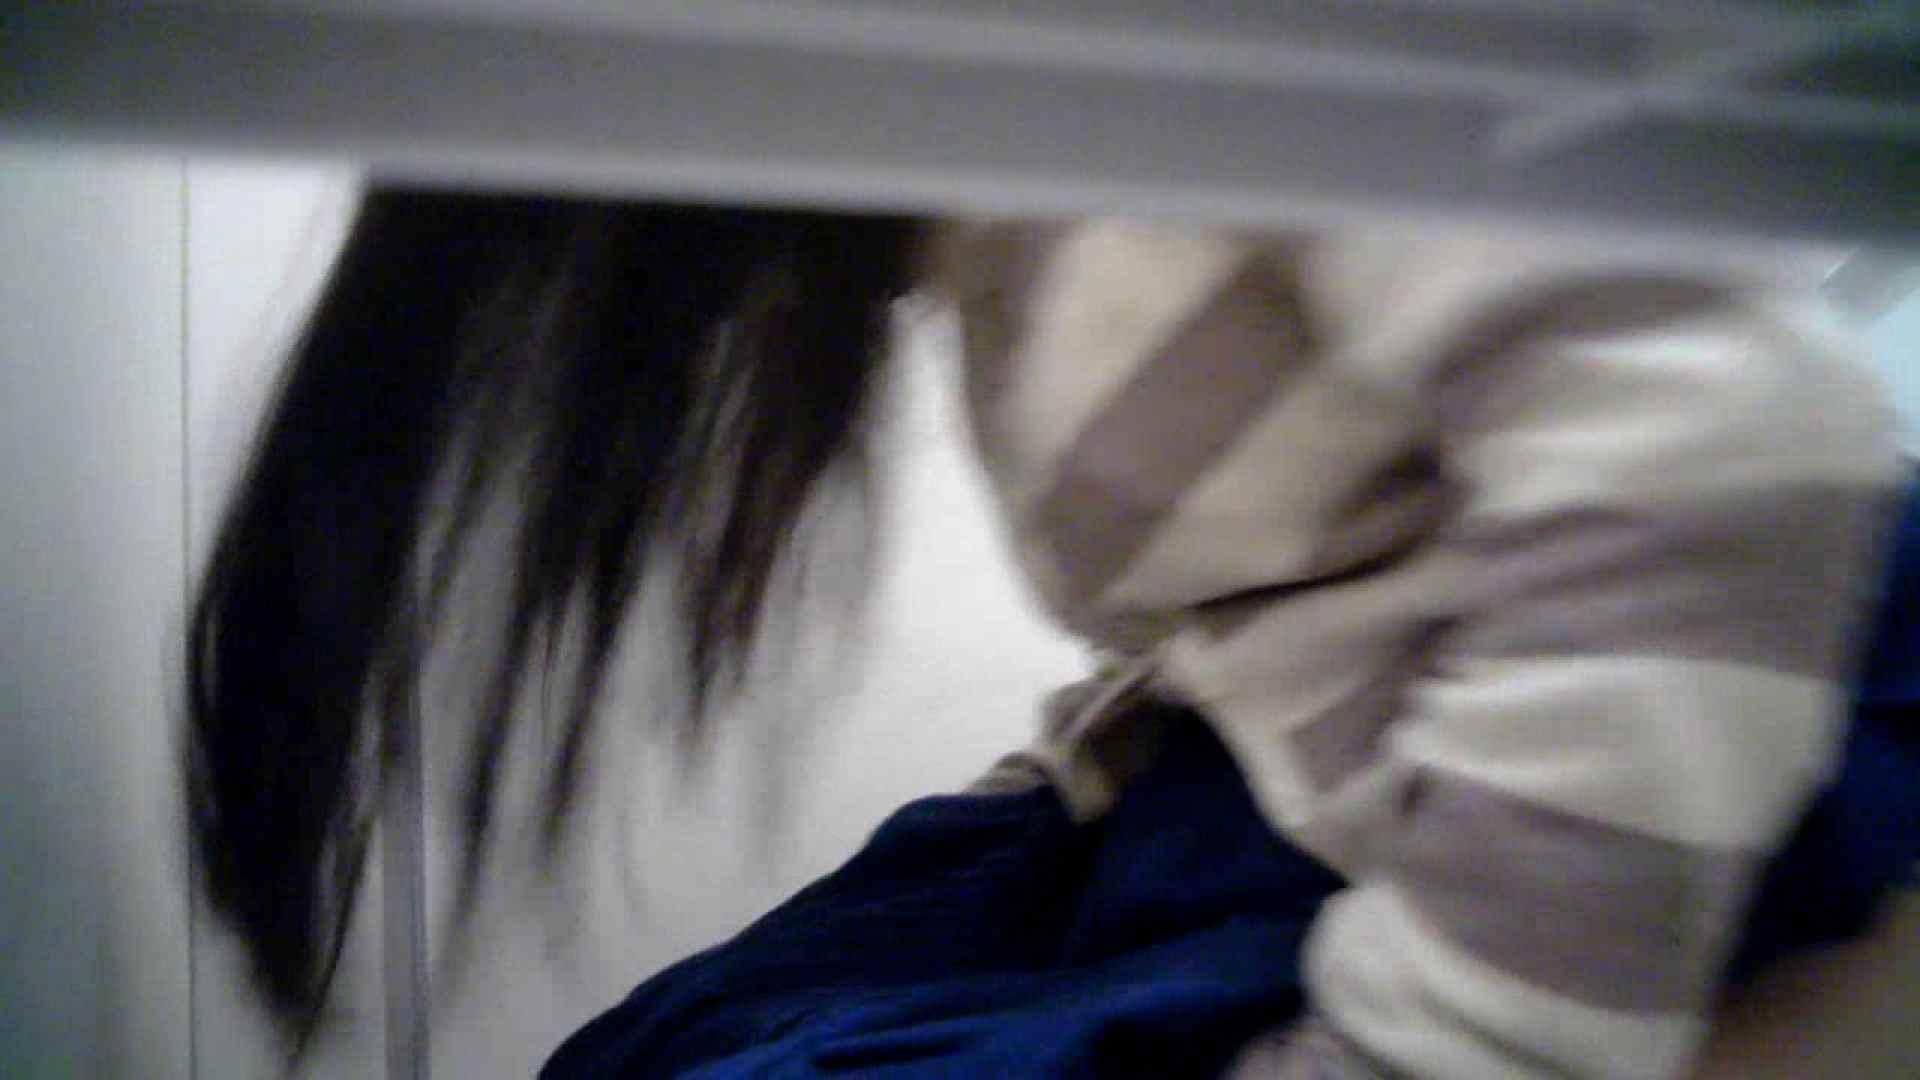 vol.28 最近では、黒いナプキンも売っているので…ファッ! 洗面所 隠し撮りAV無料 45pic 30